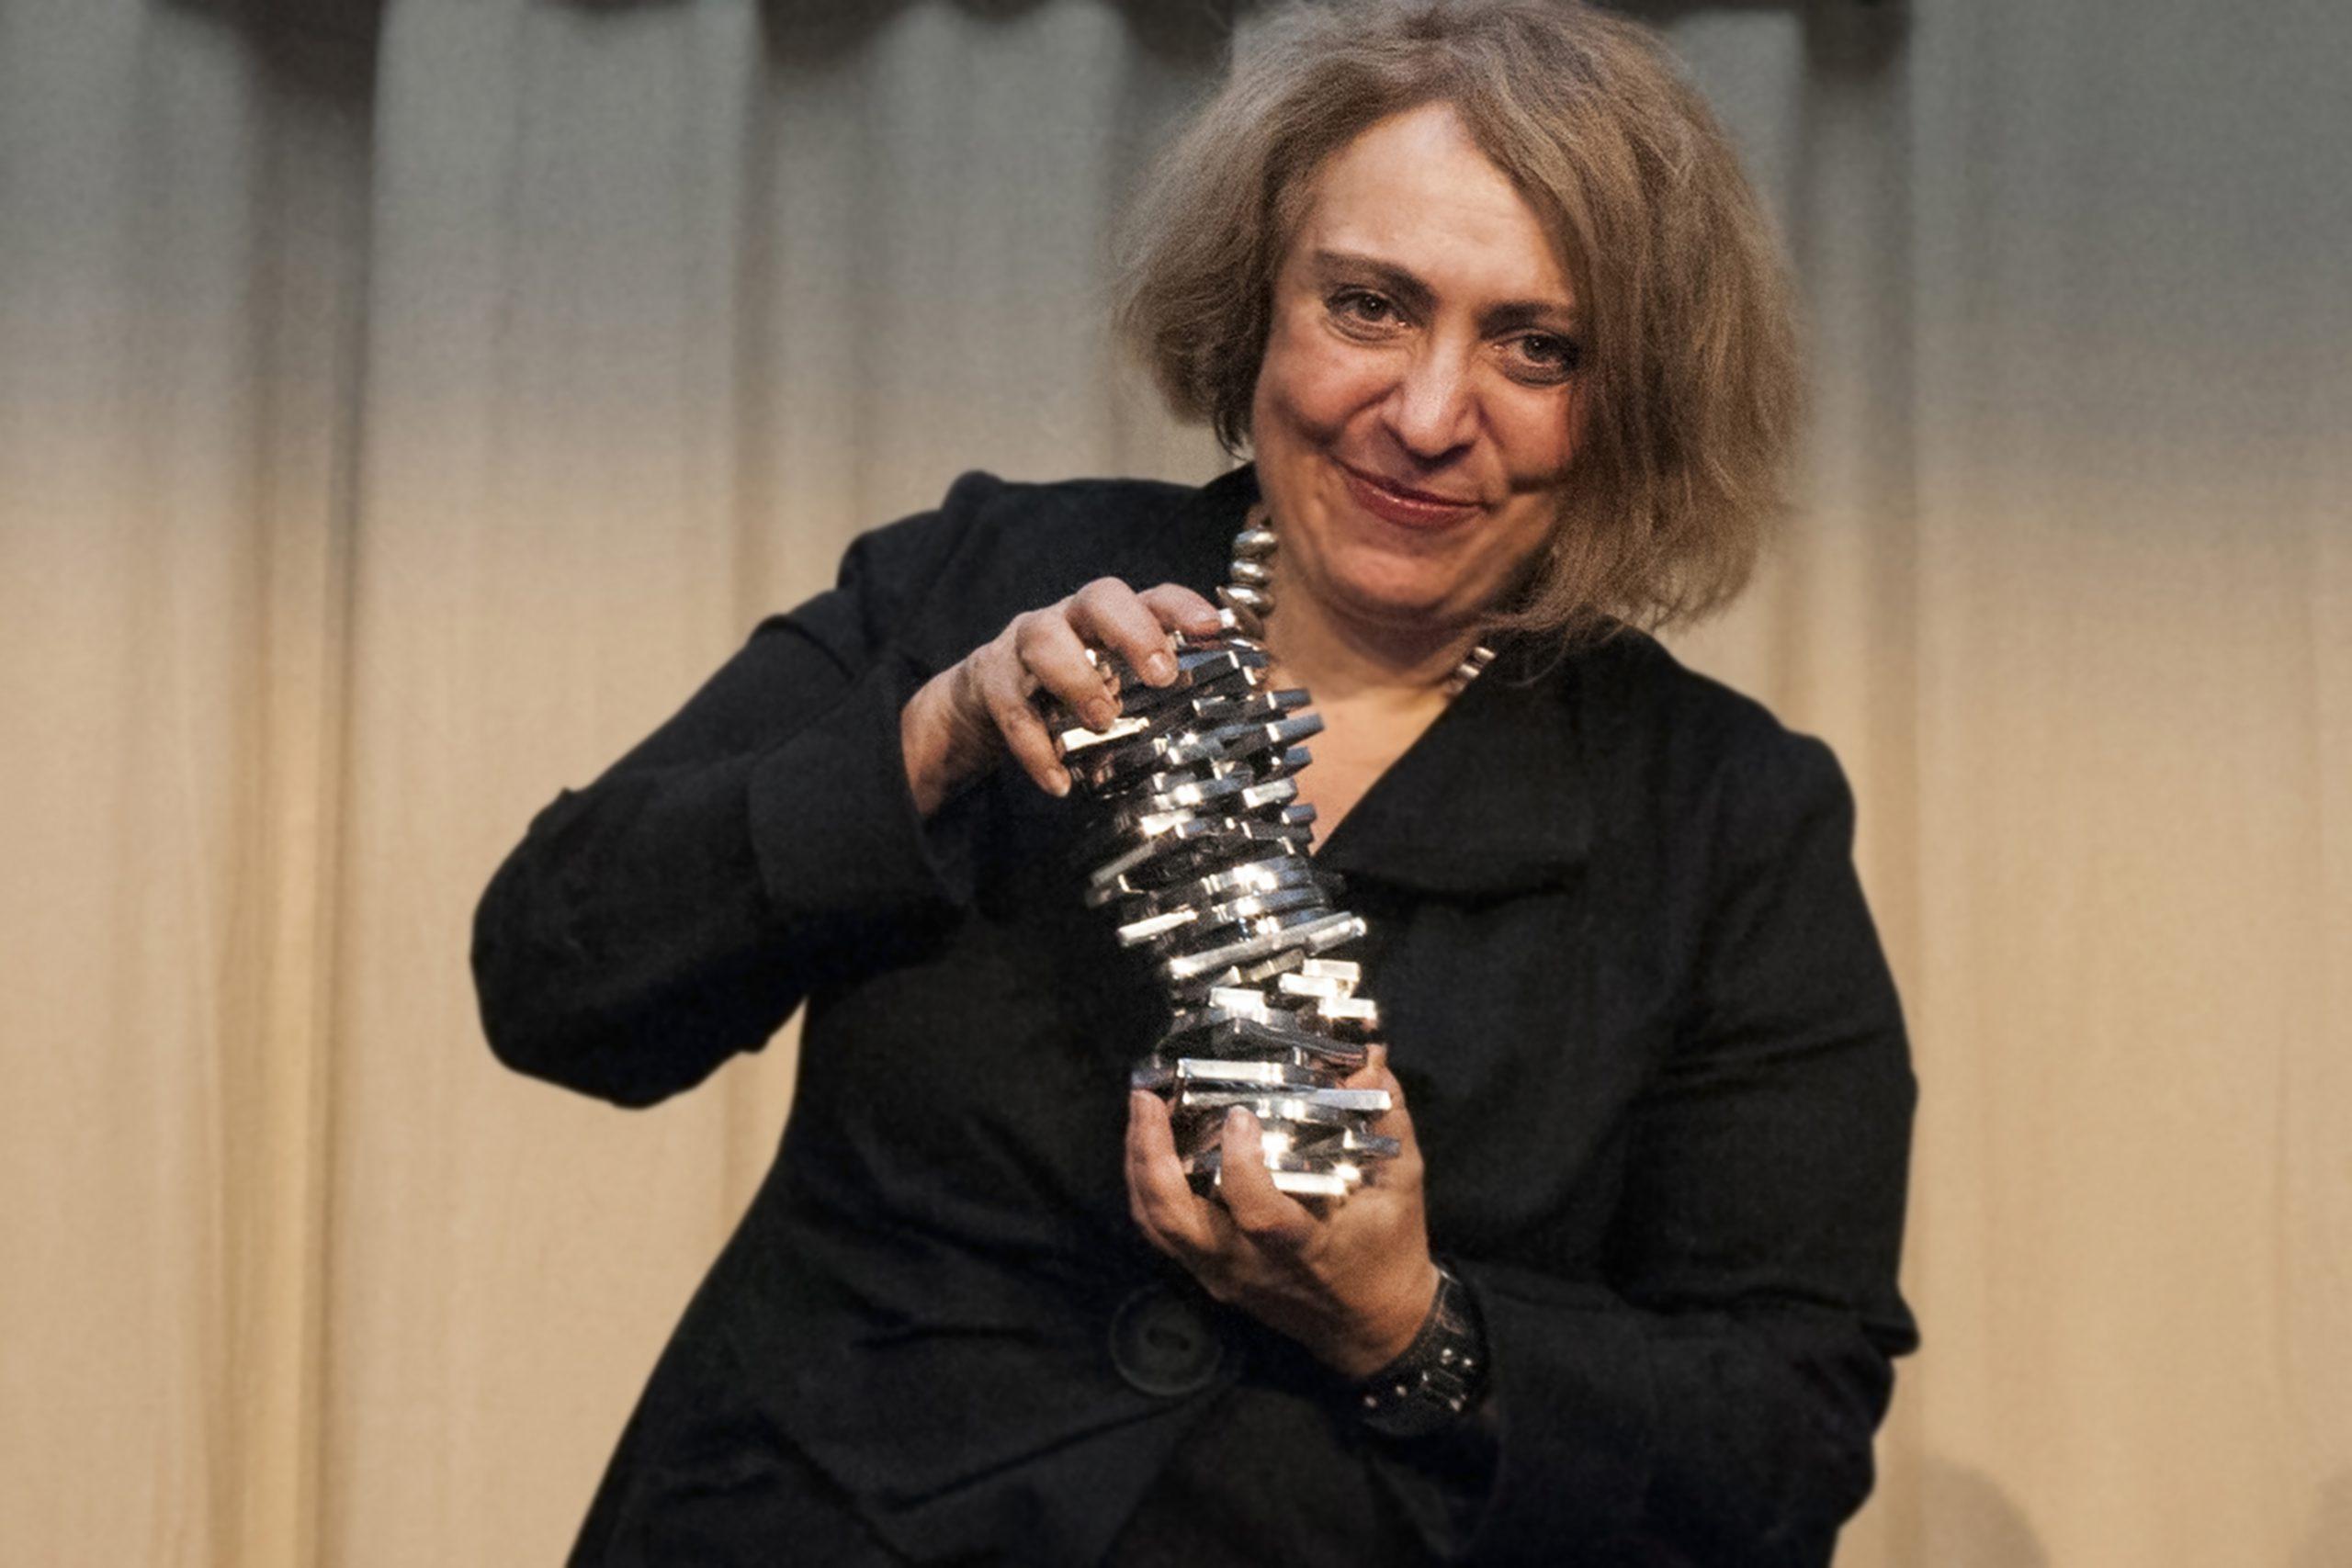 Ekaterina Degot, winner of the Igor Zabel Award for Culture and Theory 2014. Photo: Barbara Zeidler